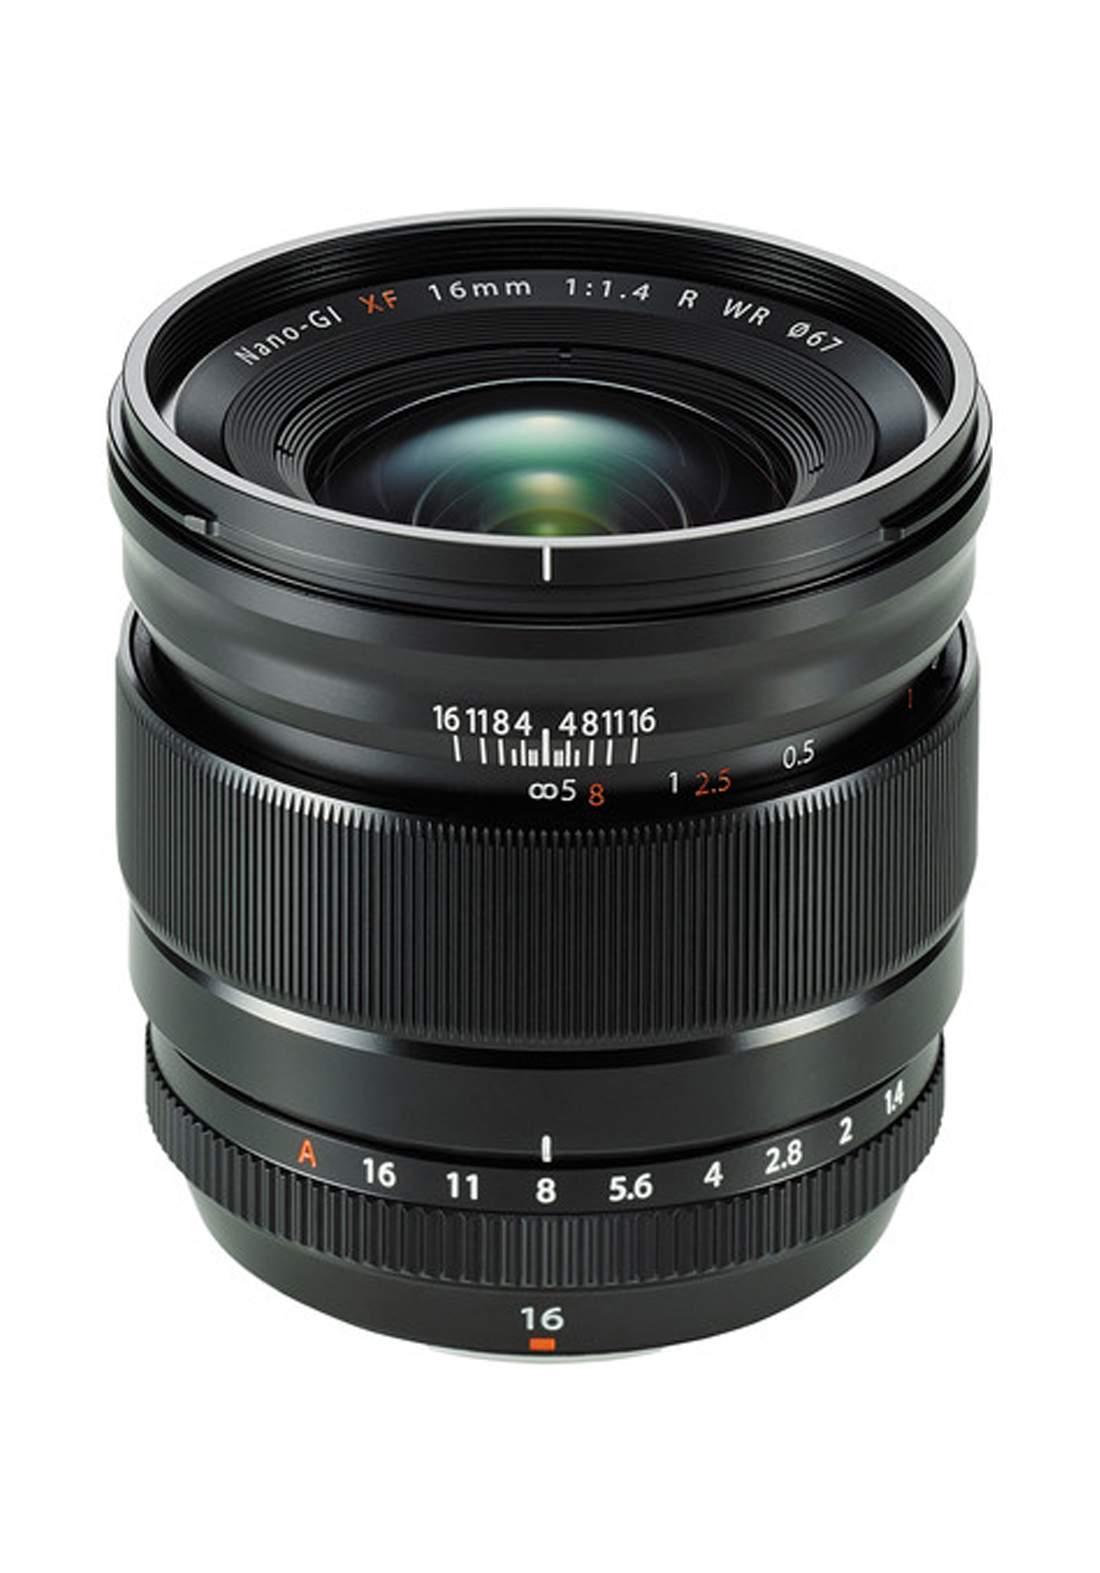 Fujifilm  XF 16mm F1.4 R WR Lens - Black عدسة كاميرا